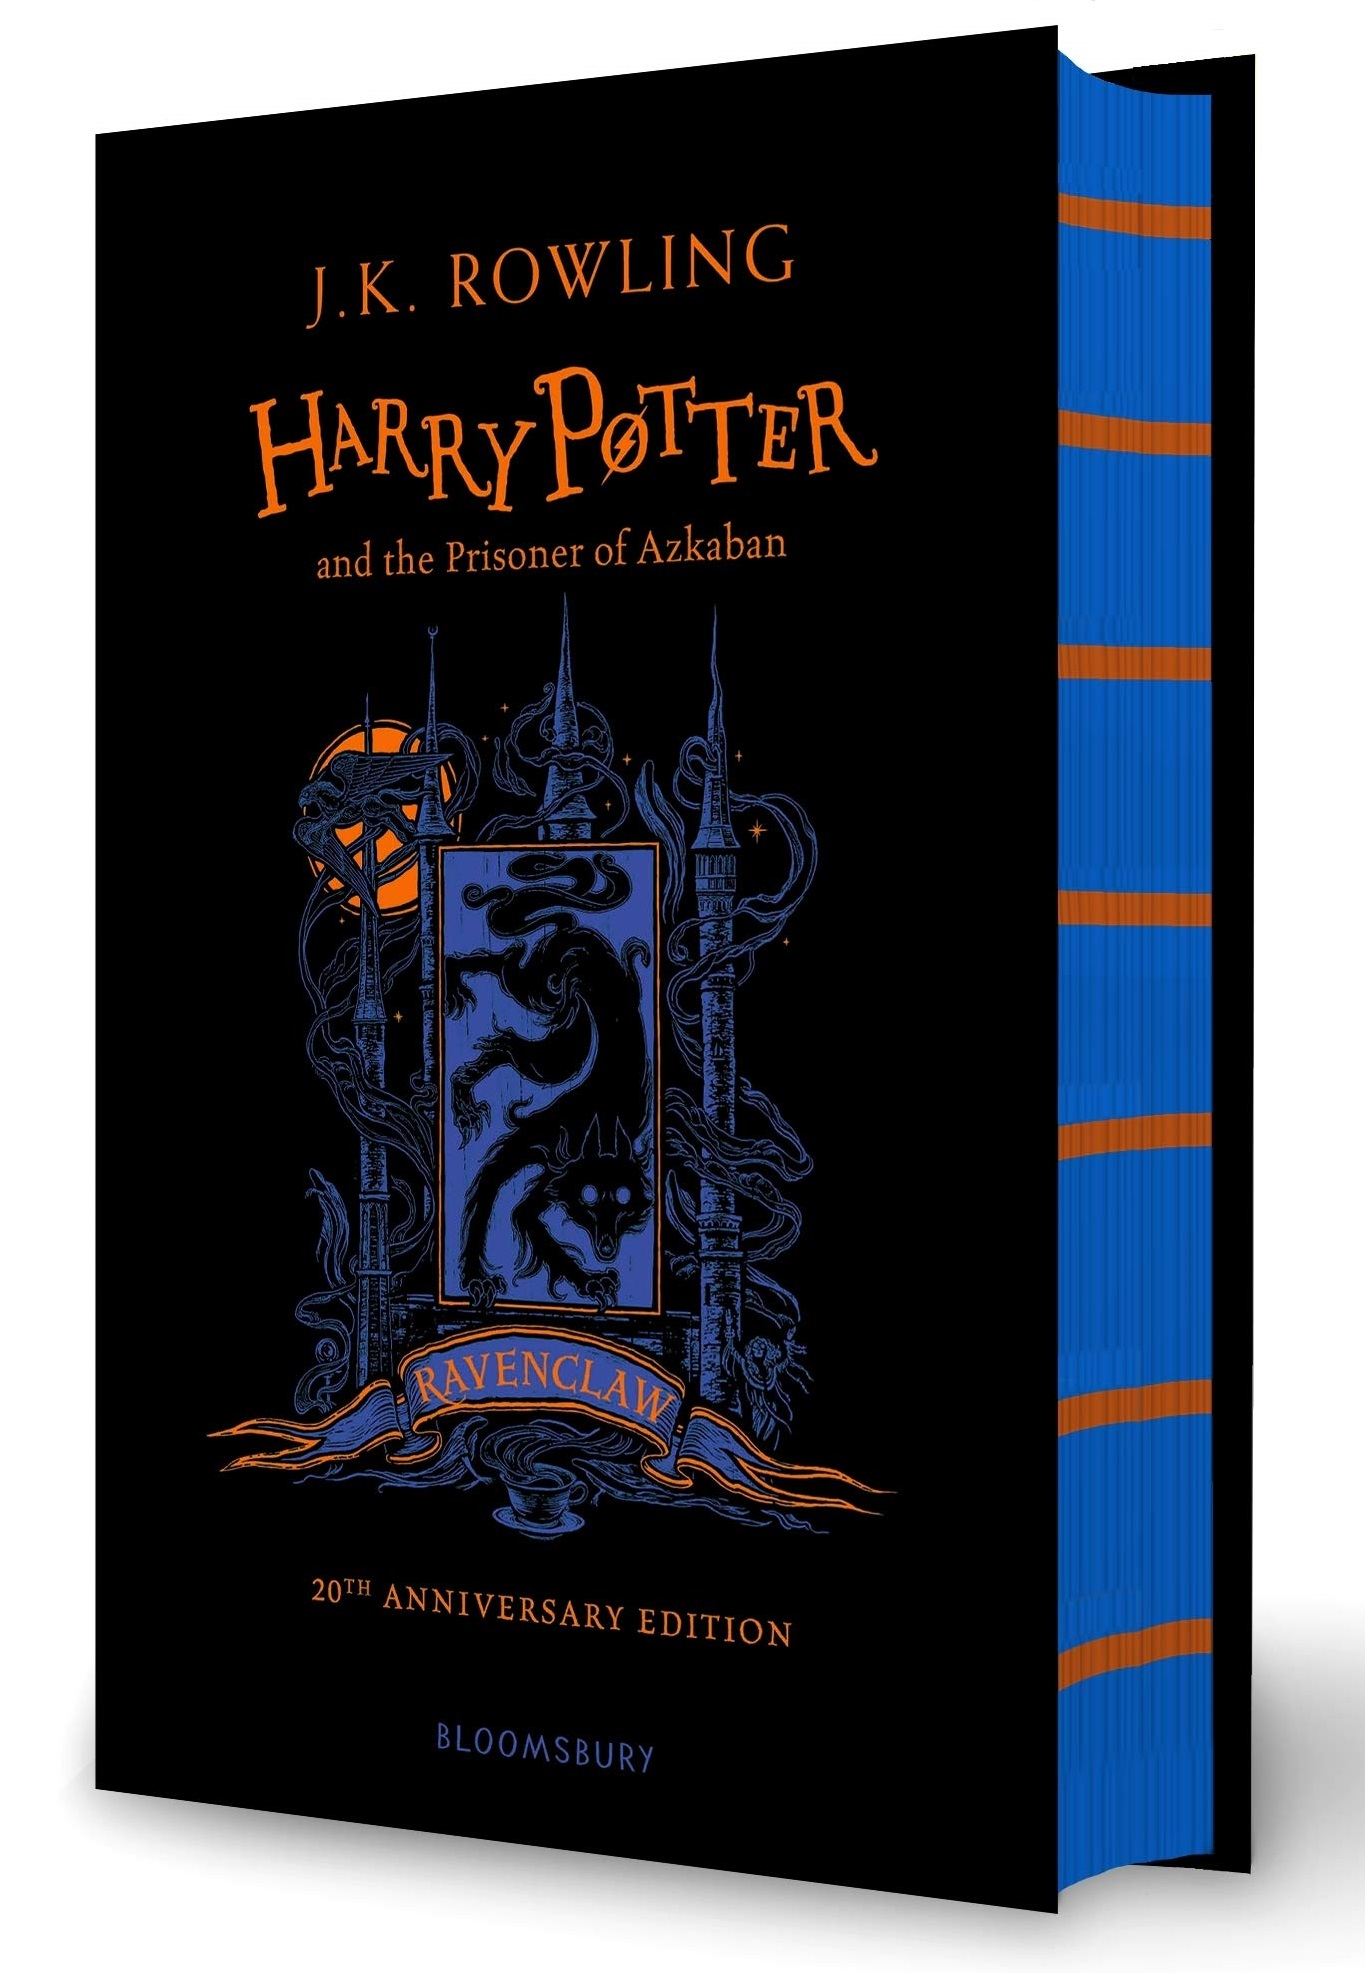 Harry Potter and the Prisoner of Azkaban: Ravenclaw Edition